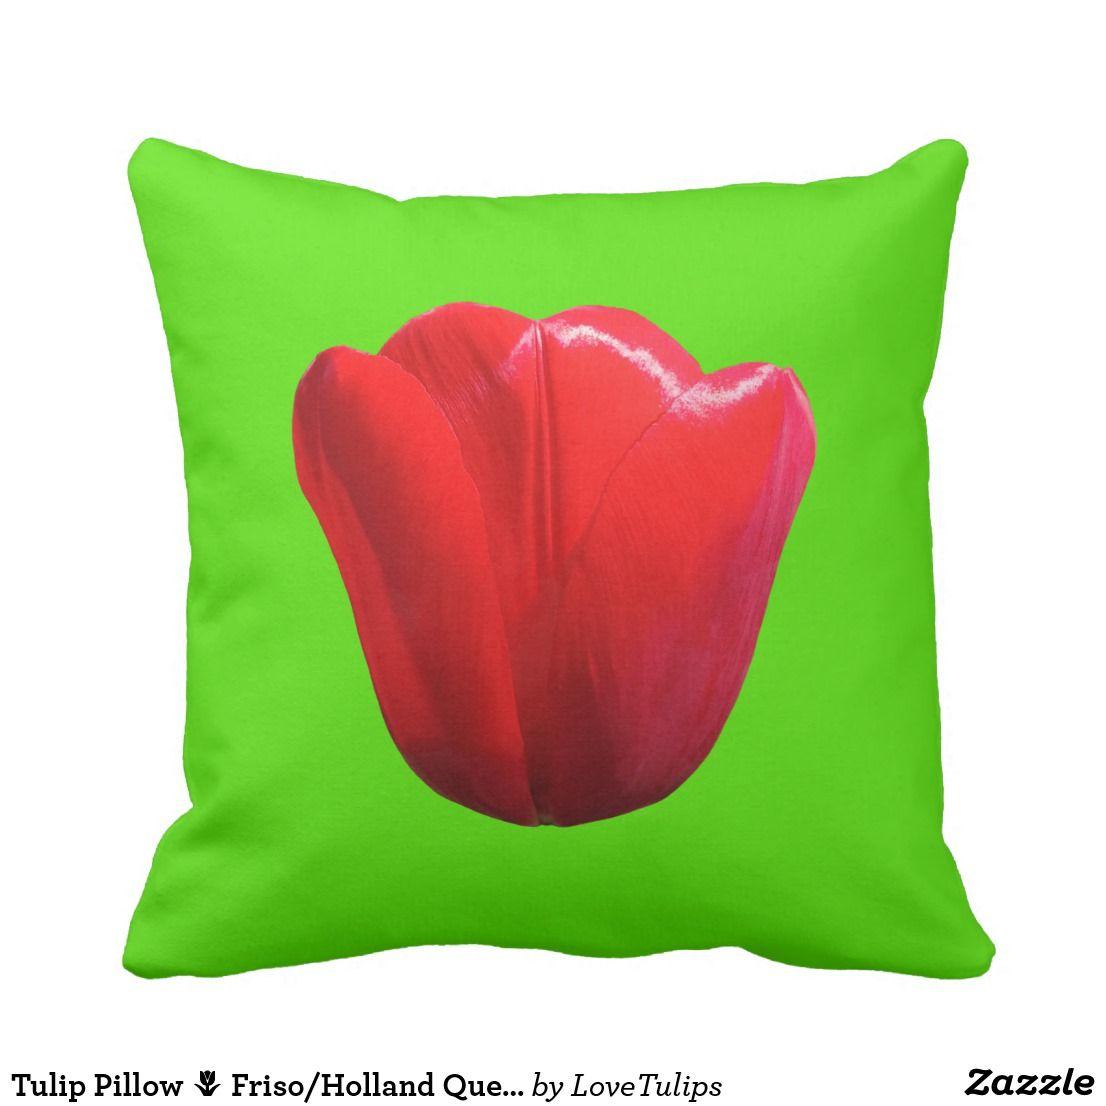 Tulip Pillow Friso Holland Queen Tulips Tulip Pillow Pillows Decorative Throw Pillows